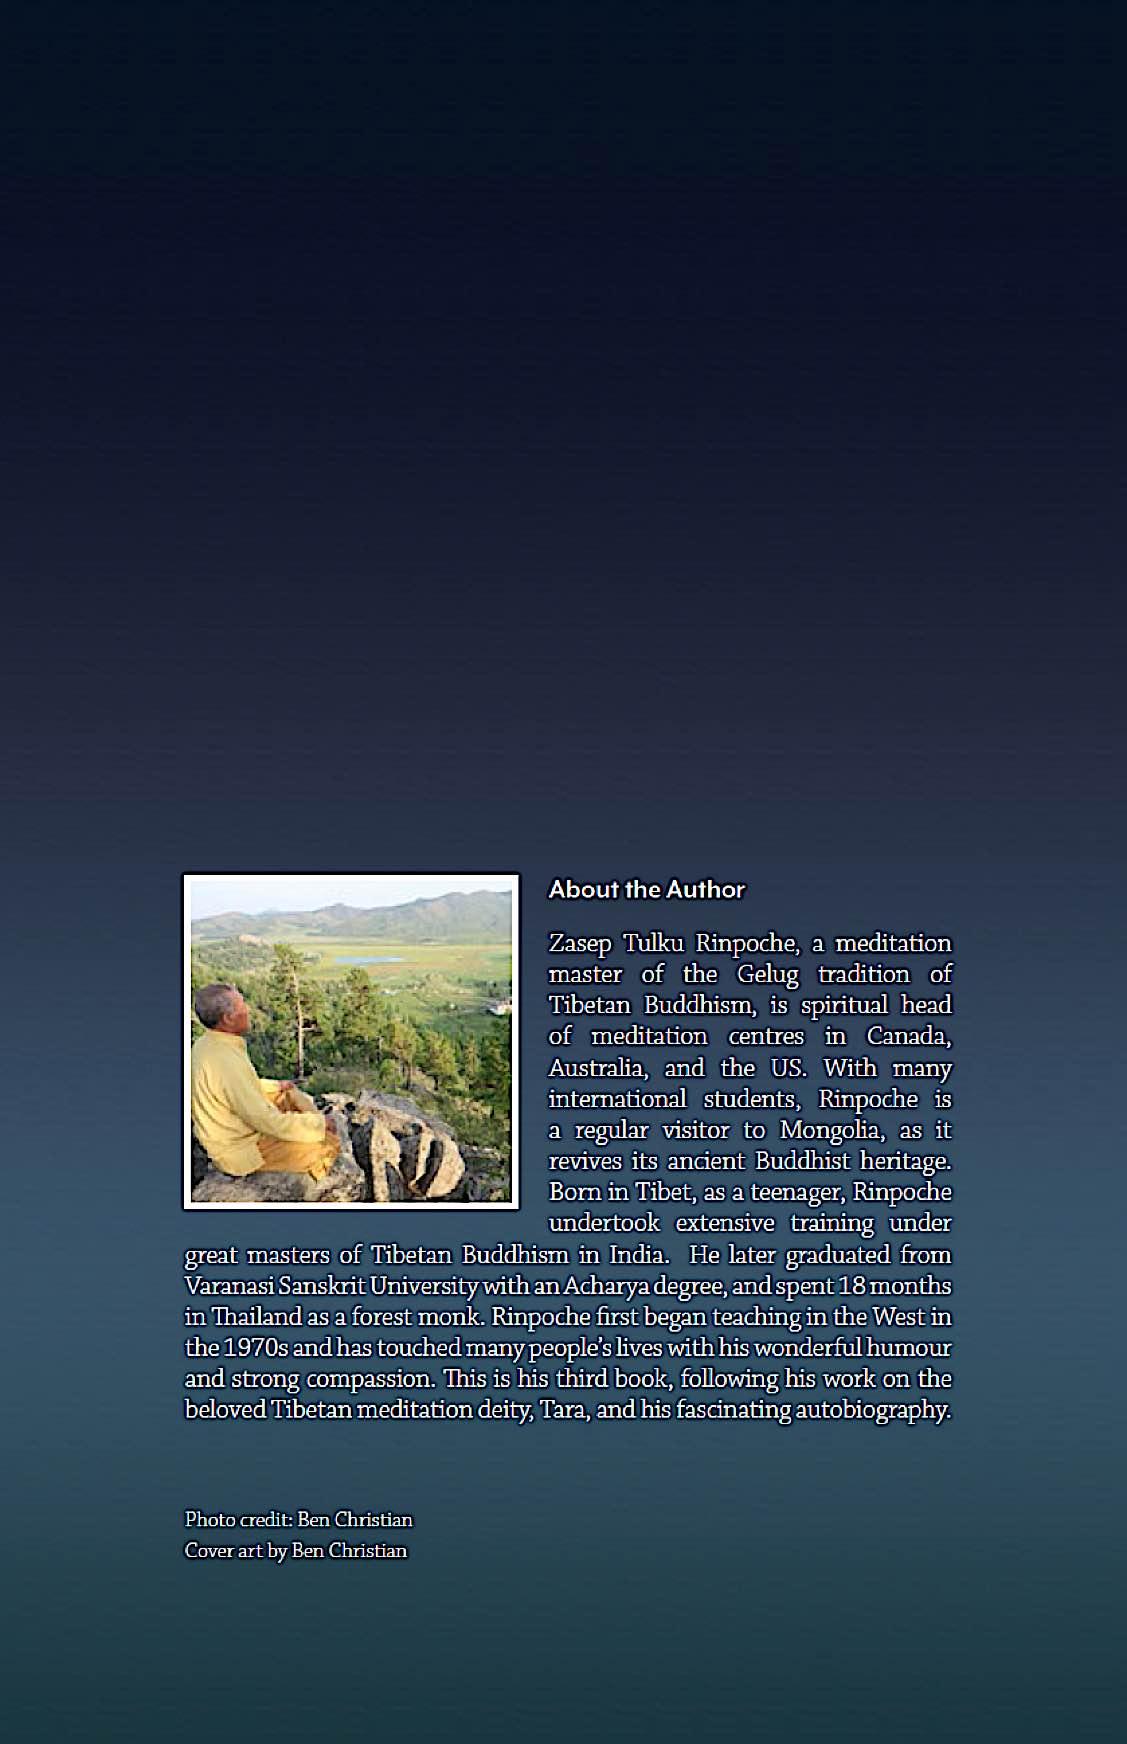 Buddha Weekly Back Cover Gelug Mahamudra book Zasep Tulku Rinpoche Biography Buddhism